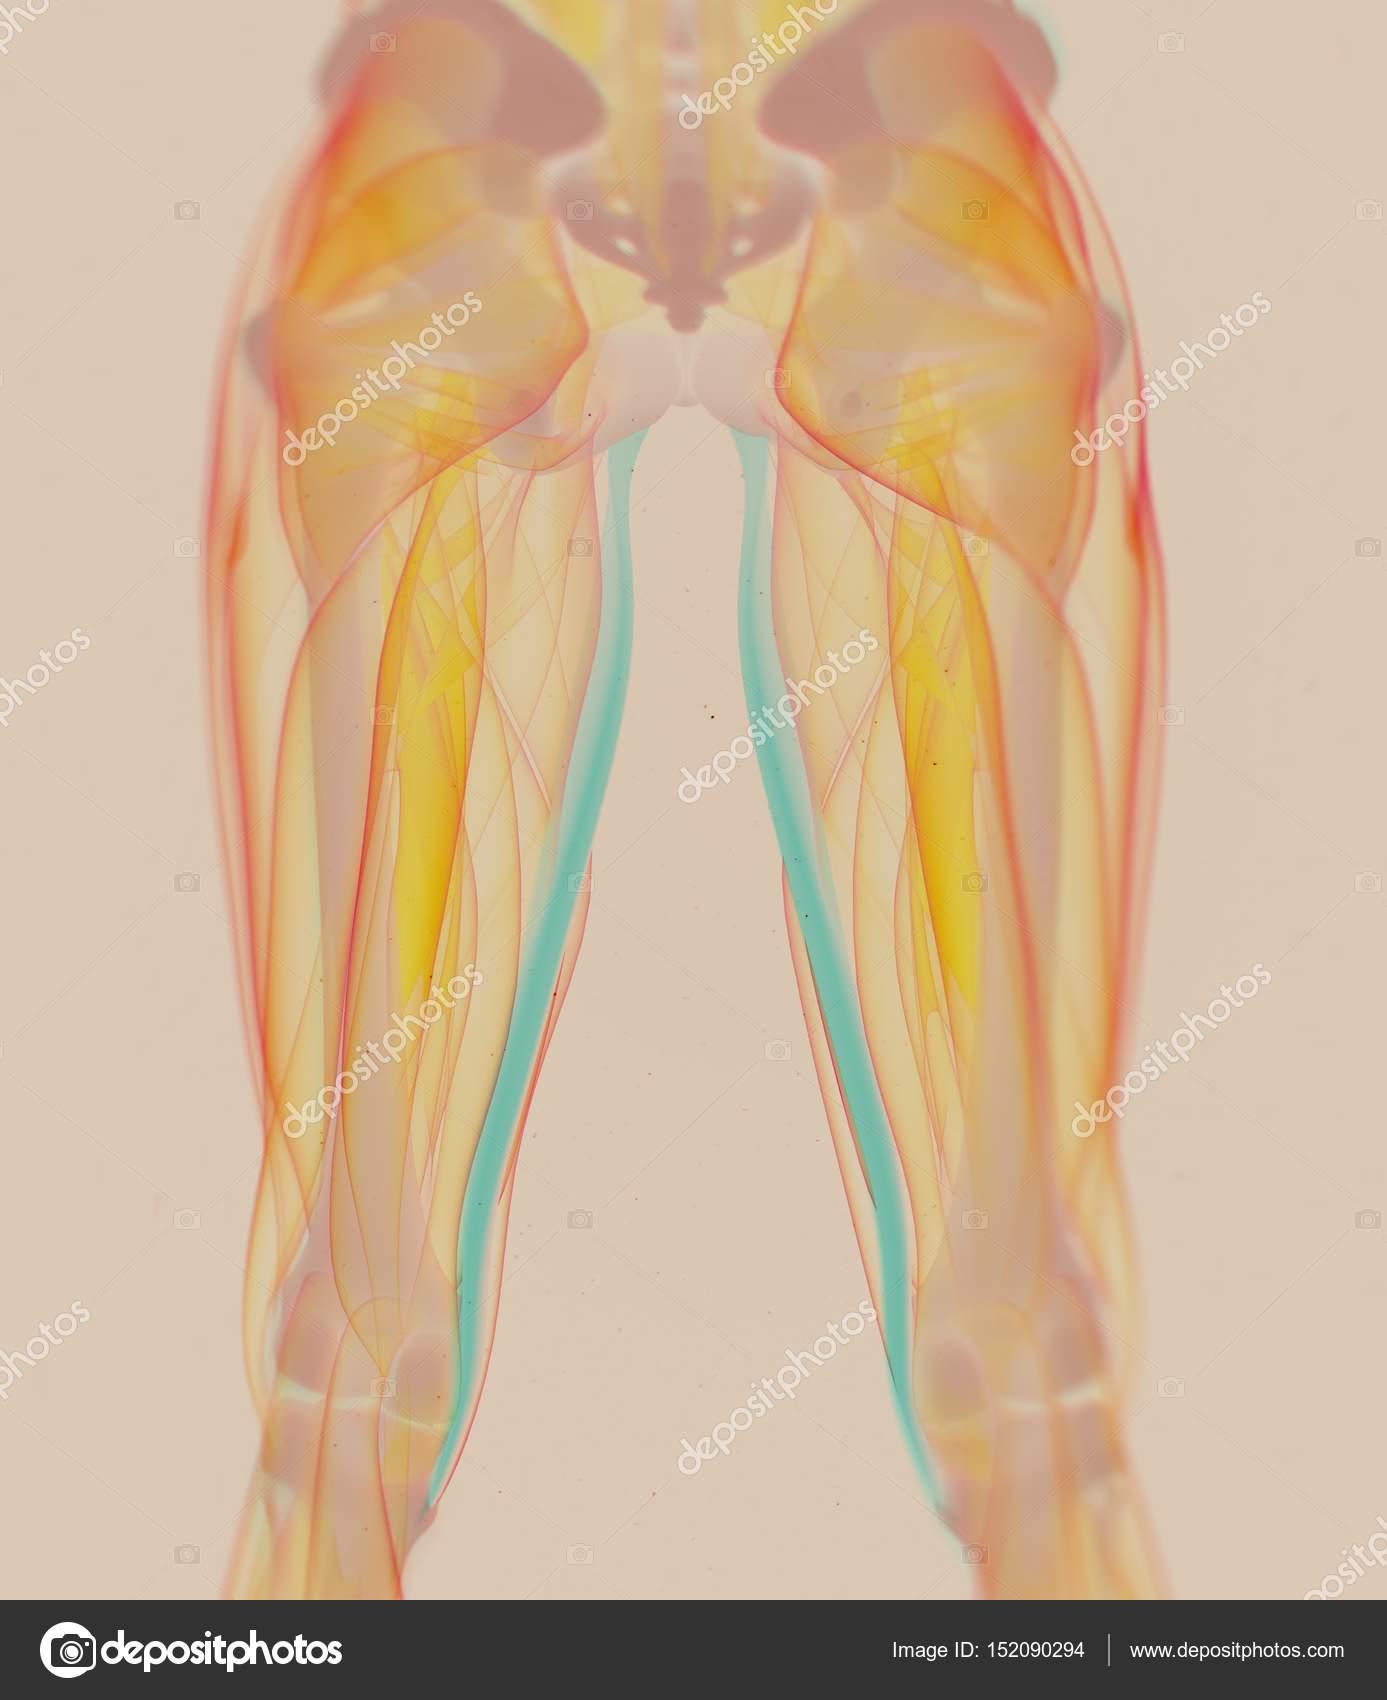 hight resolution of gracilis muscles anatomy model stock photo